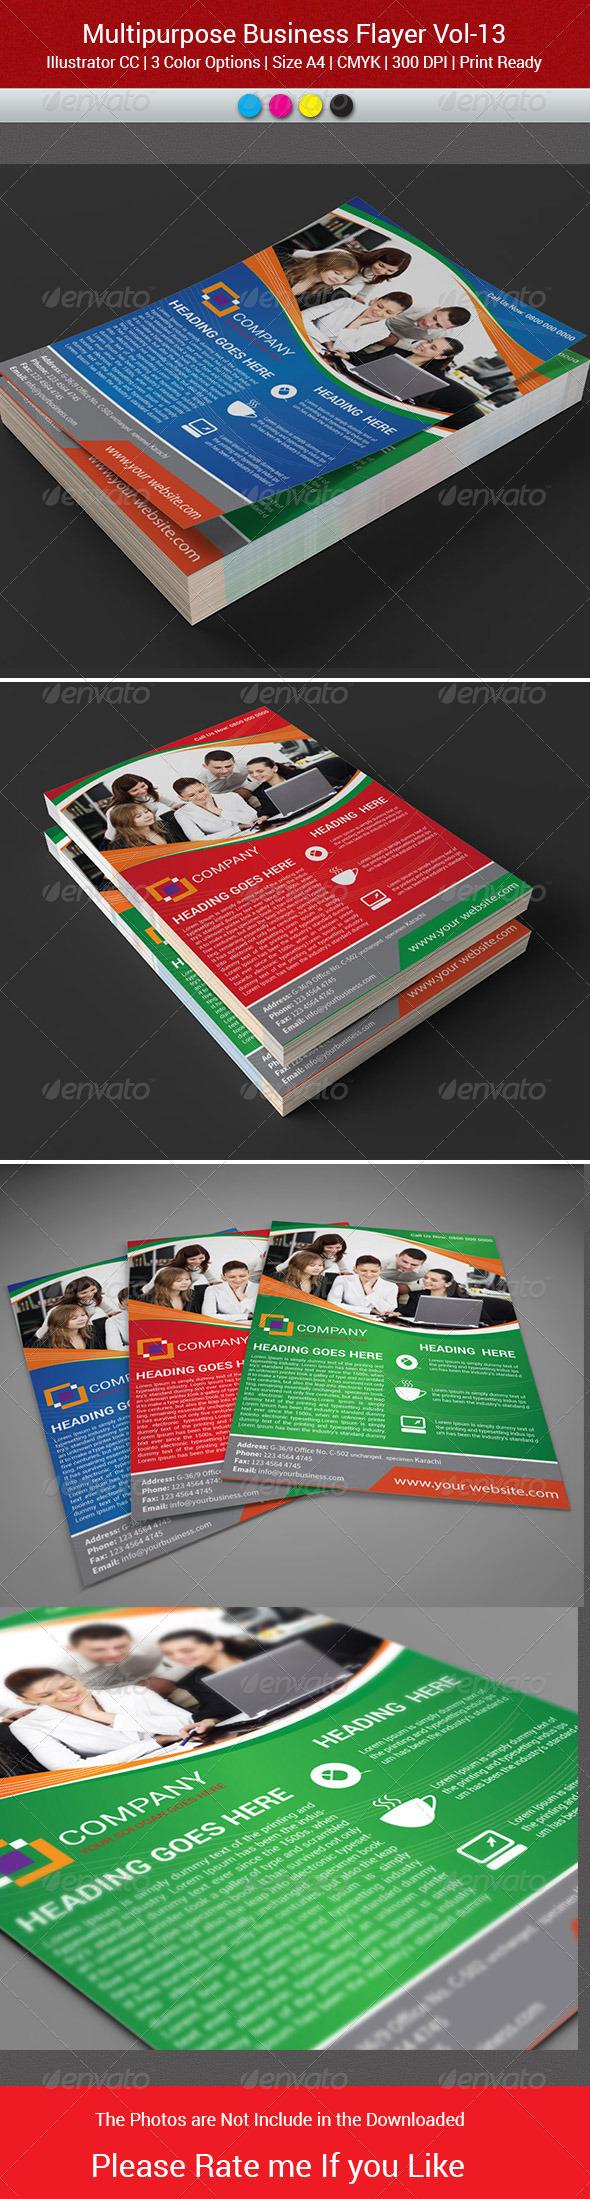 GraphicRiver MultiPurpose Business Flyer-Vol-13 7479177